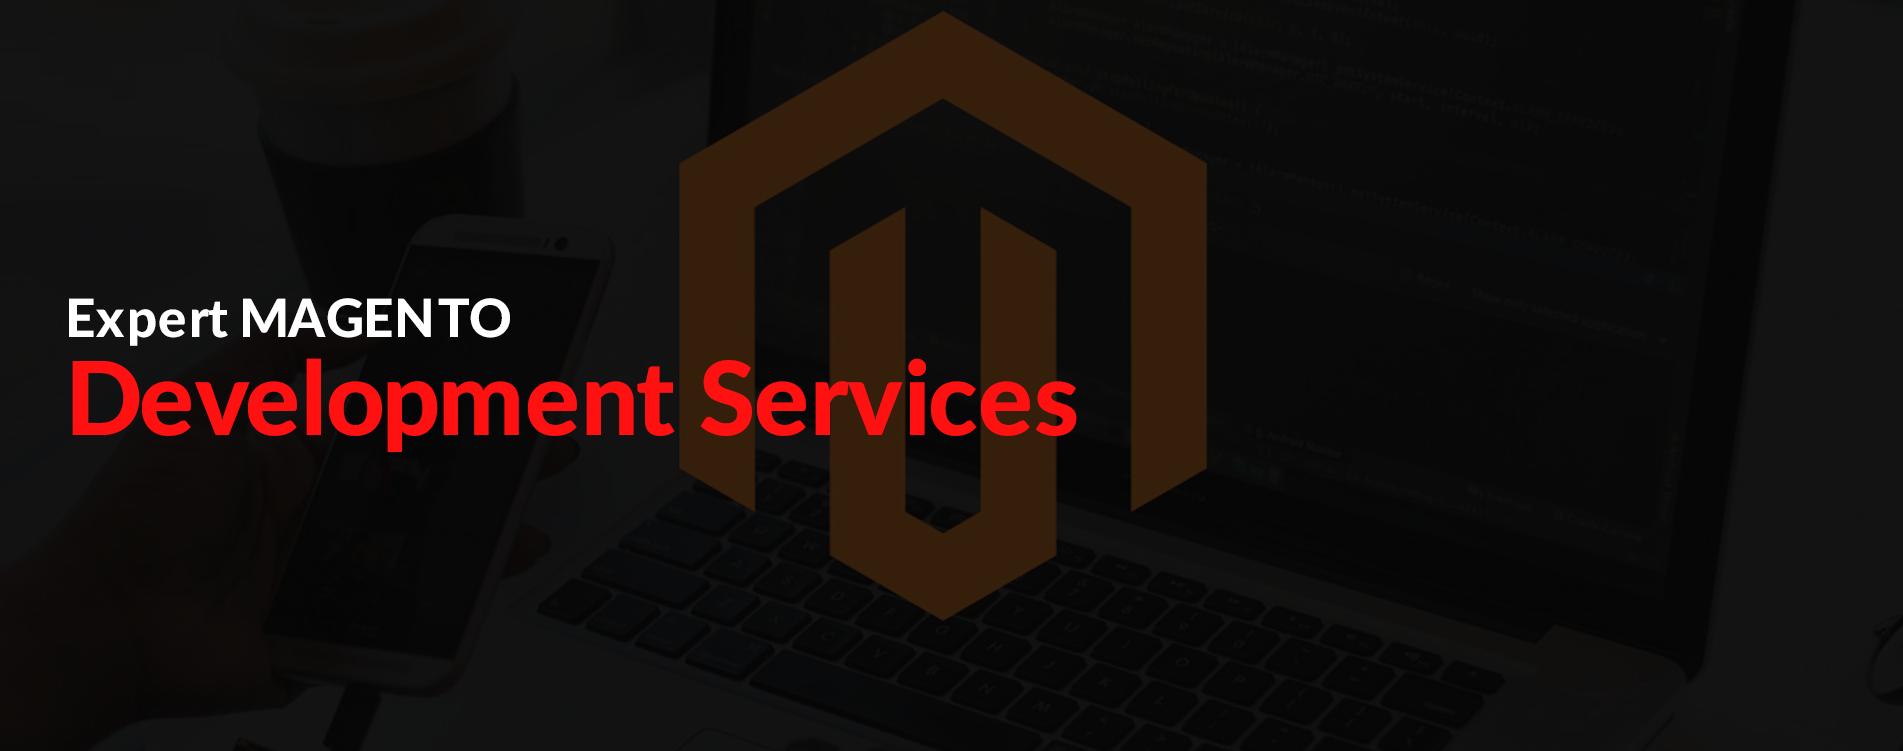 magento ecommerce developer